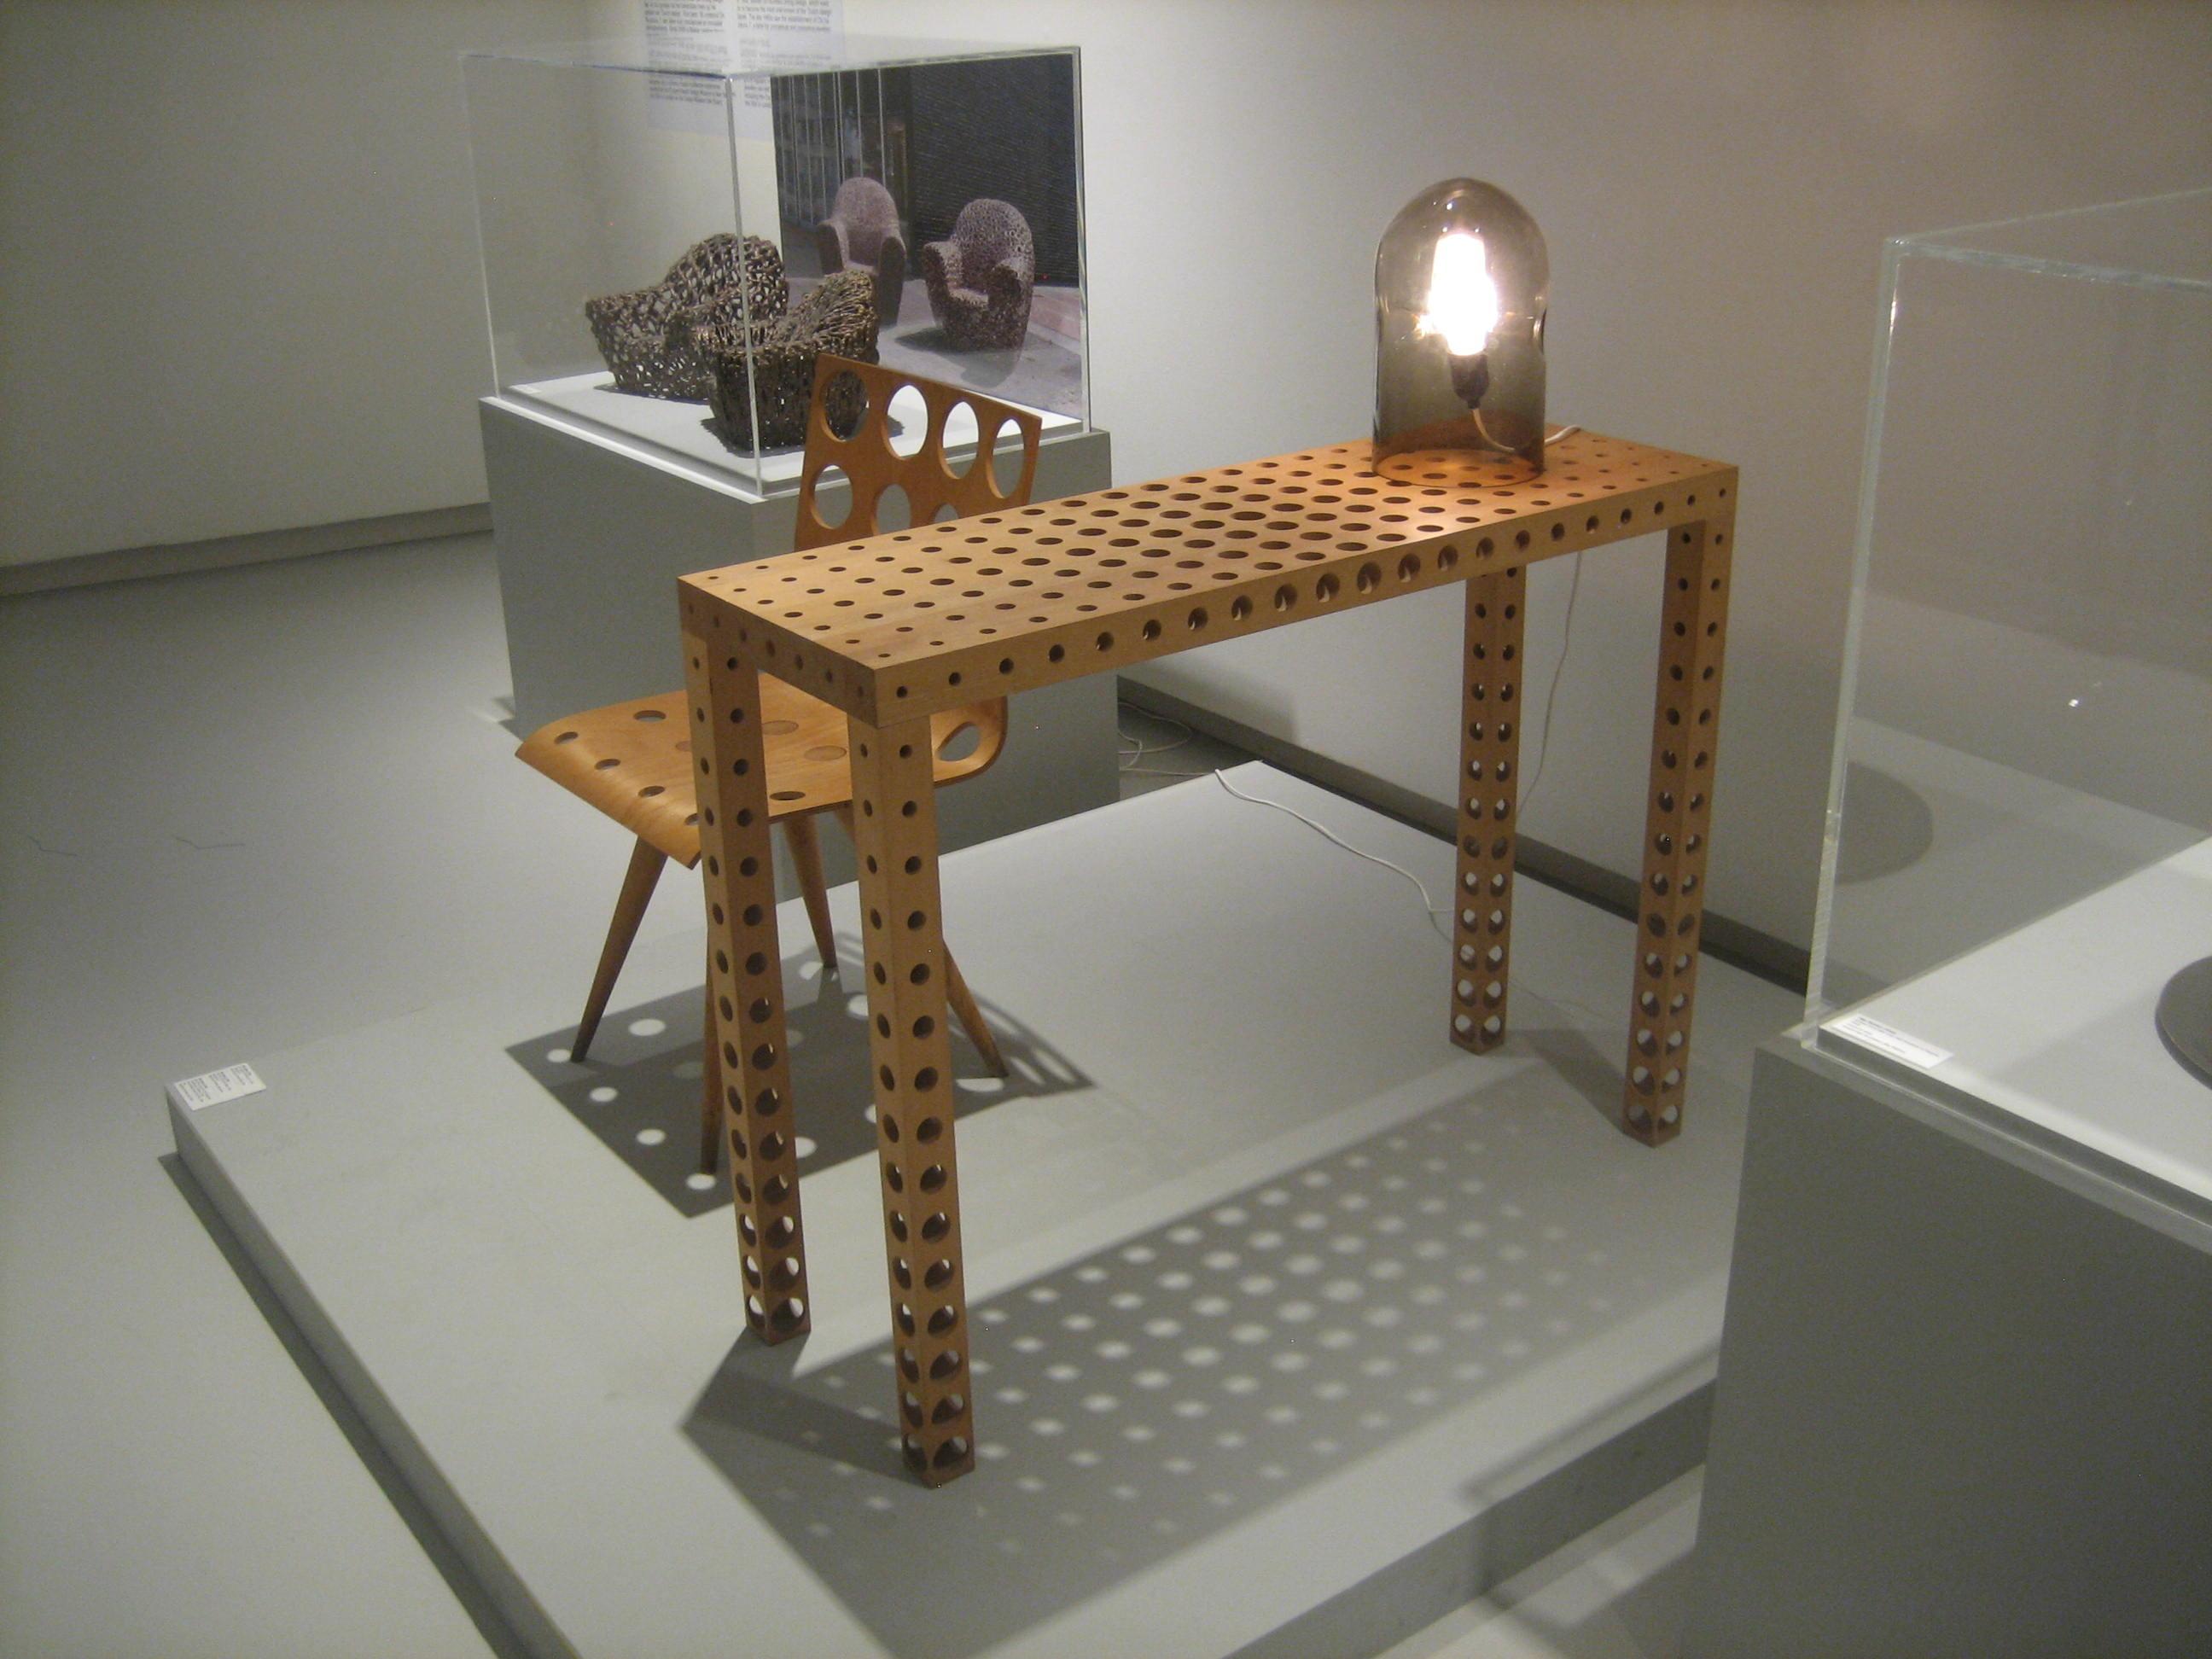 Gijs Bakker, Chair with Holes no. 2, 1991, Fruit Table with Holes, 1993 en Glass Lamp, 1978. Toen Emmy nu Gijs. Collectie Design Museum Den Bosch, tentoonstelling, vitrine, tafel, lamp, stoel, hout, glas